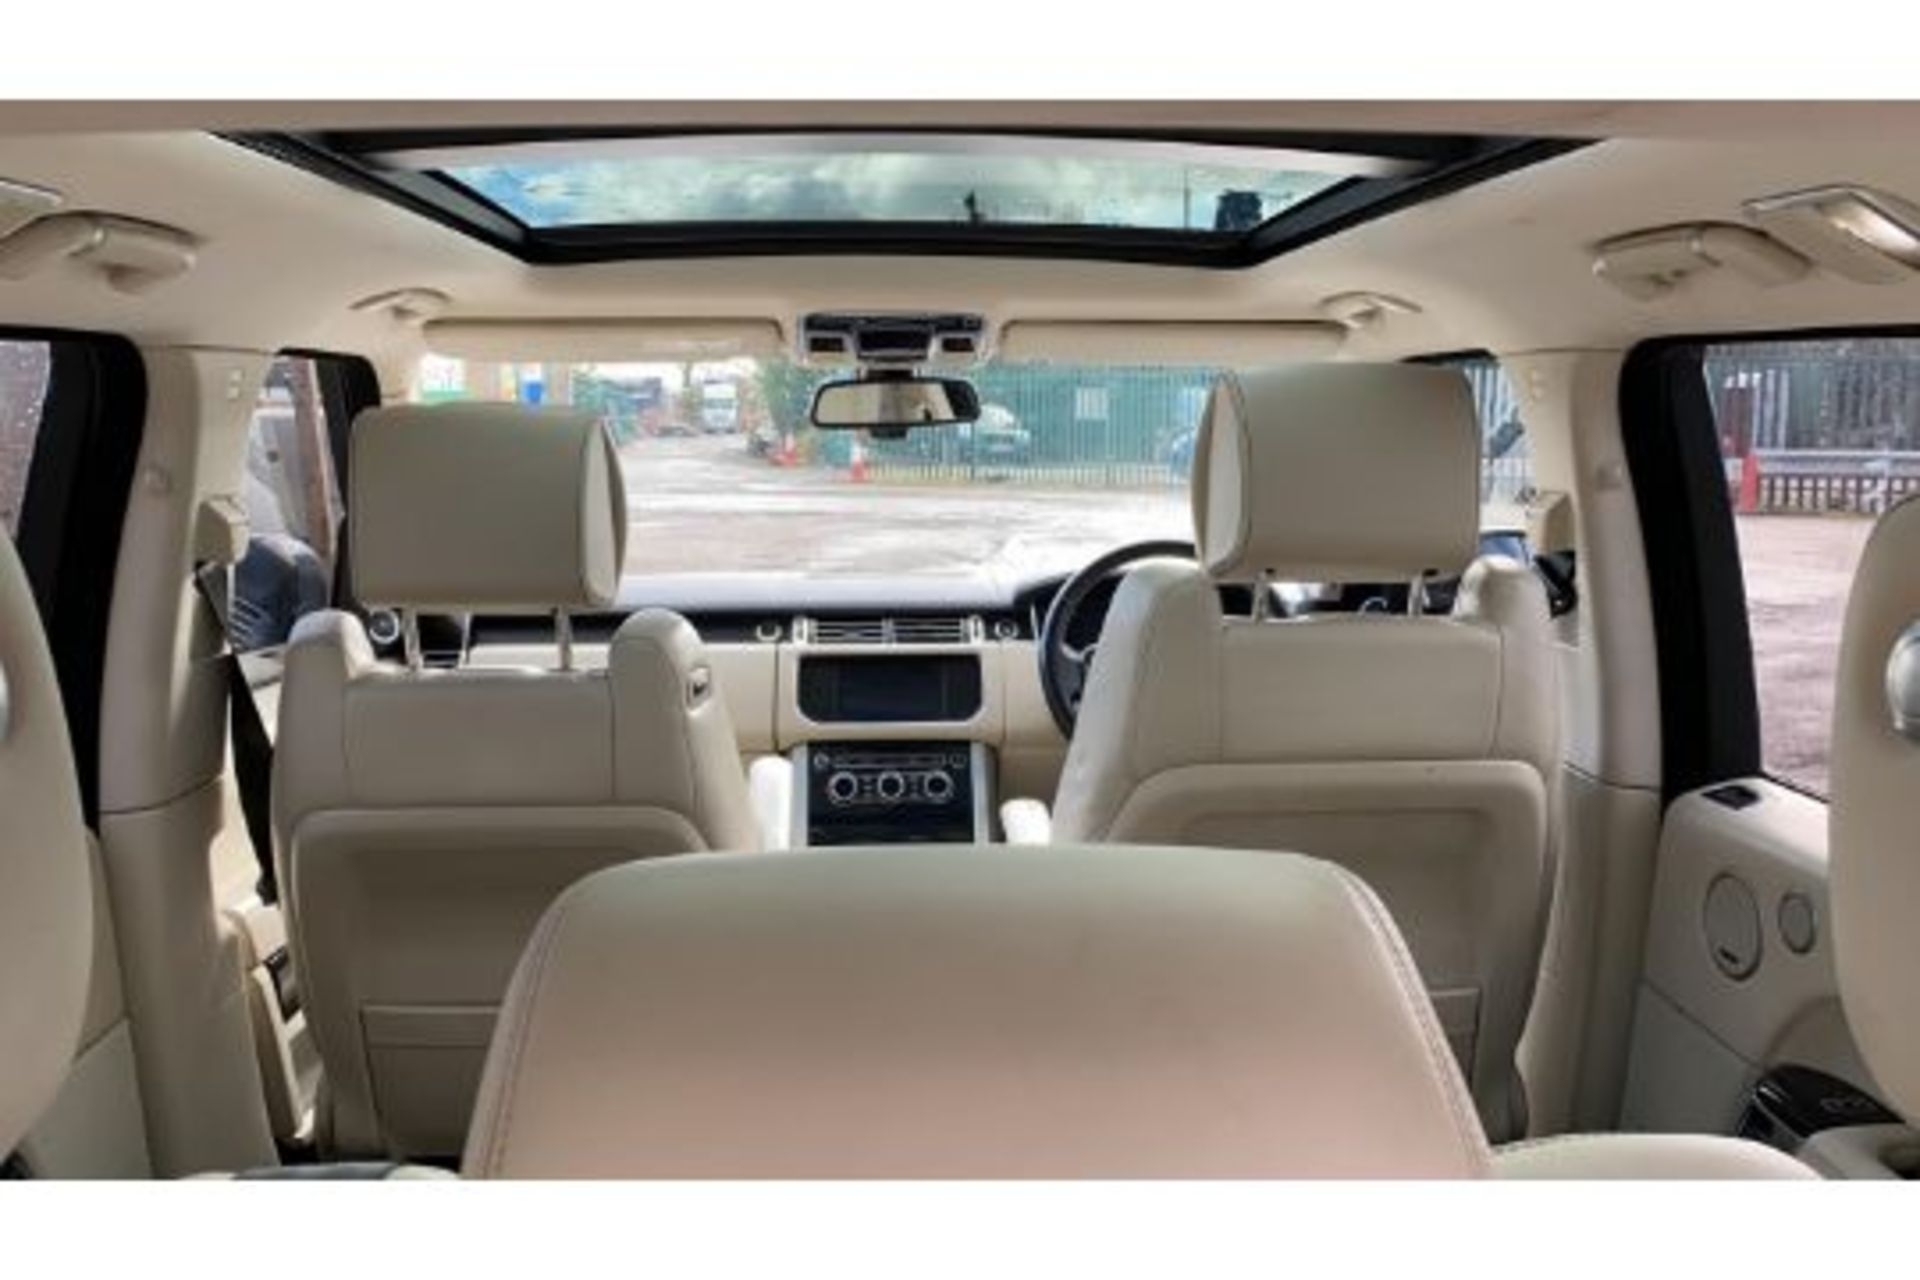 Range Rover Vogue 3.0 TDV6 SE Auto - Black Pack - NEW SHAPE - FULLY LOADED - Pan Roof - Image 15 of 30